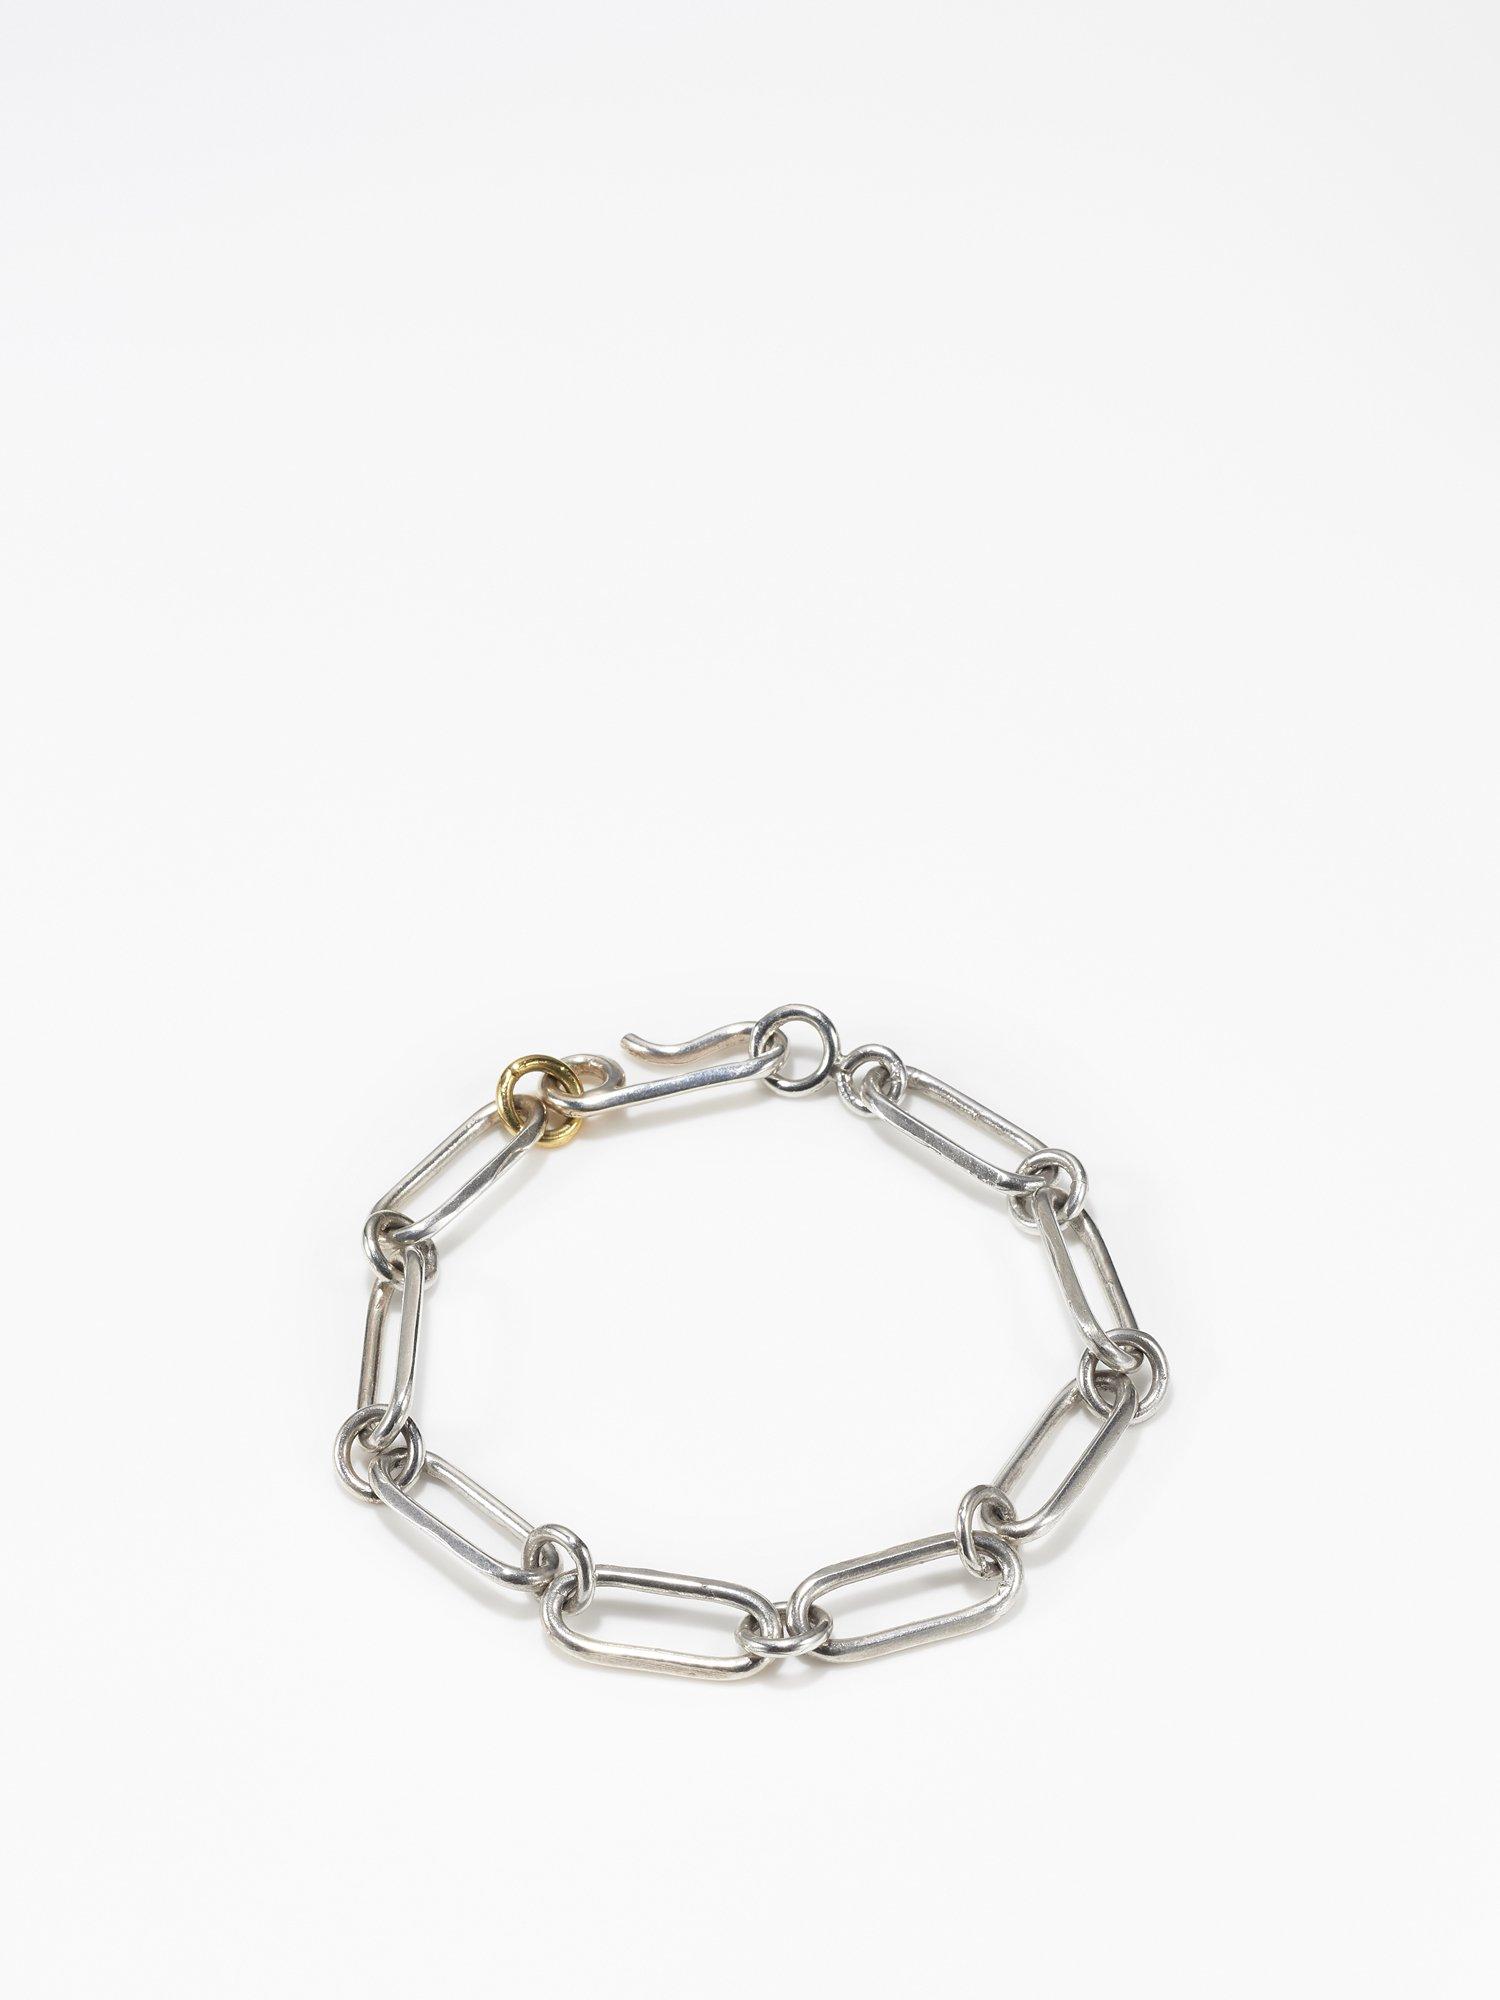 ARTEMIS / Vintage chain bracelet / 在庫商品